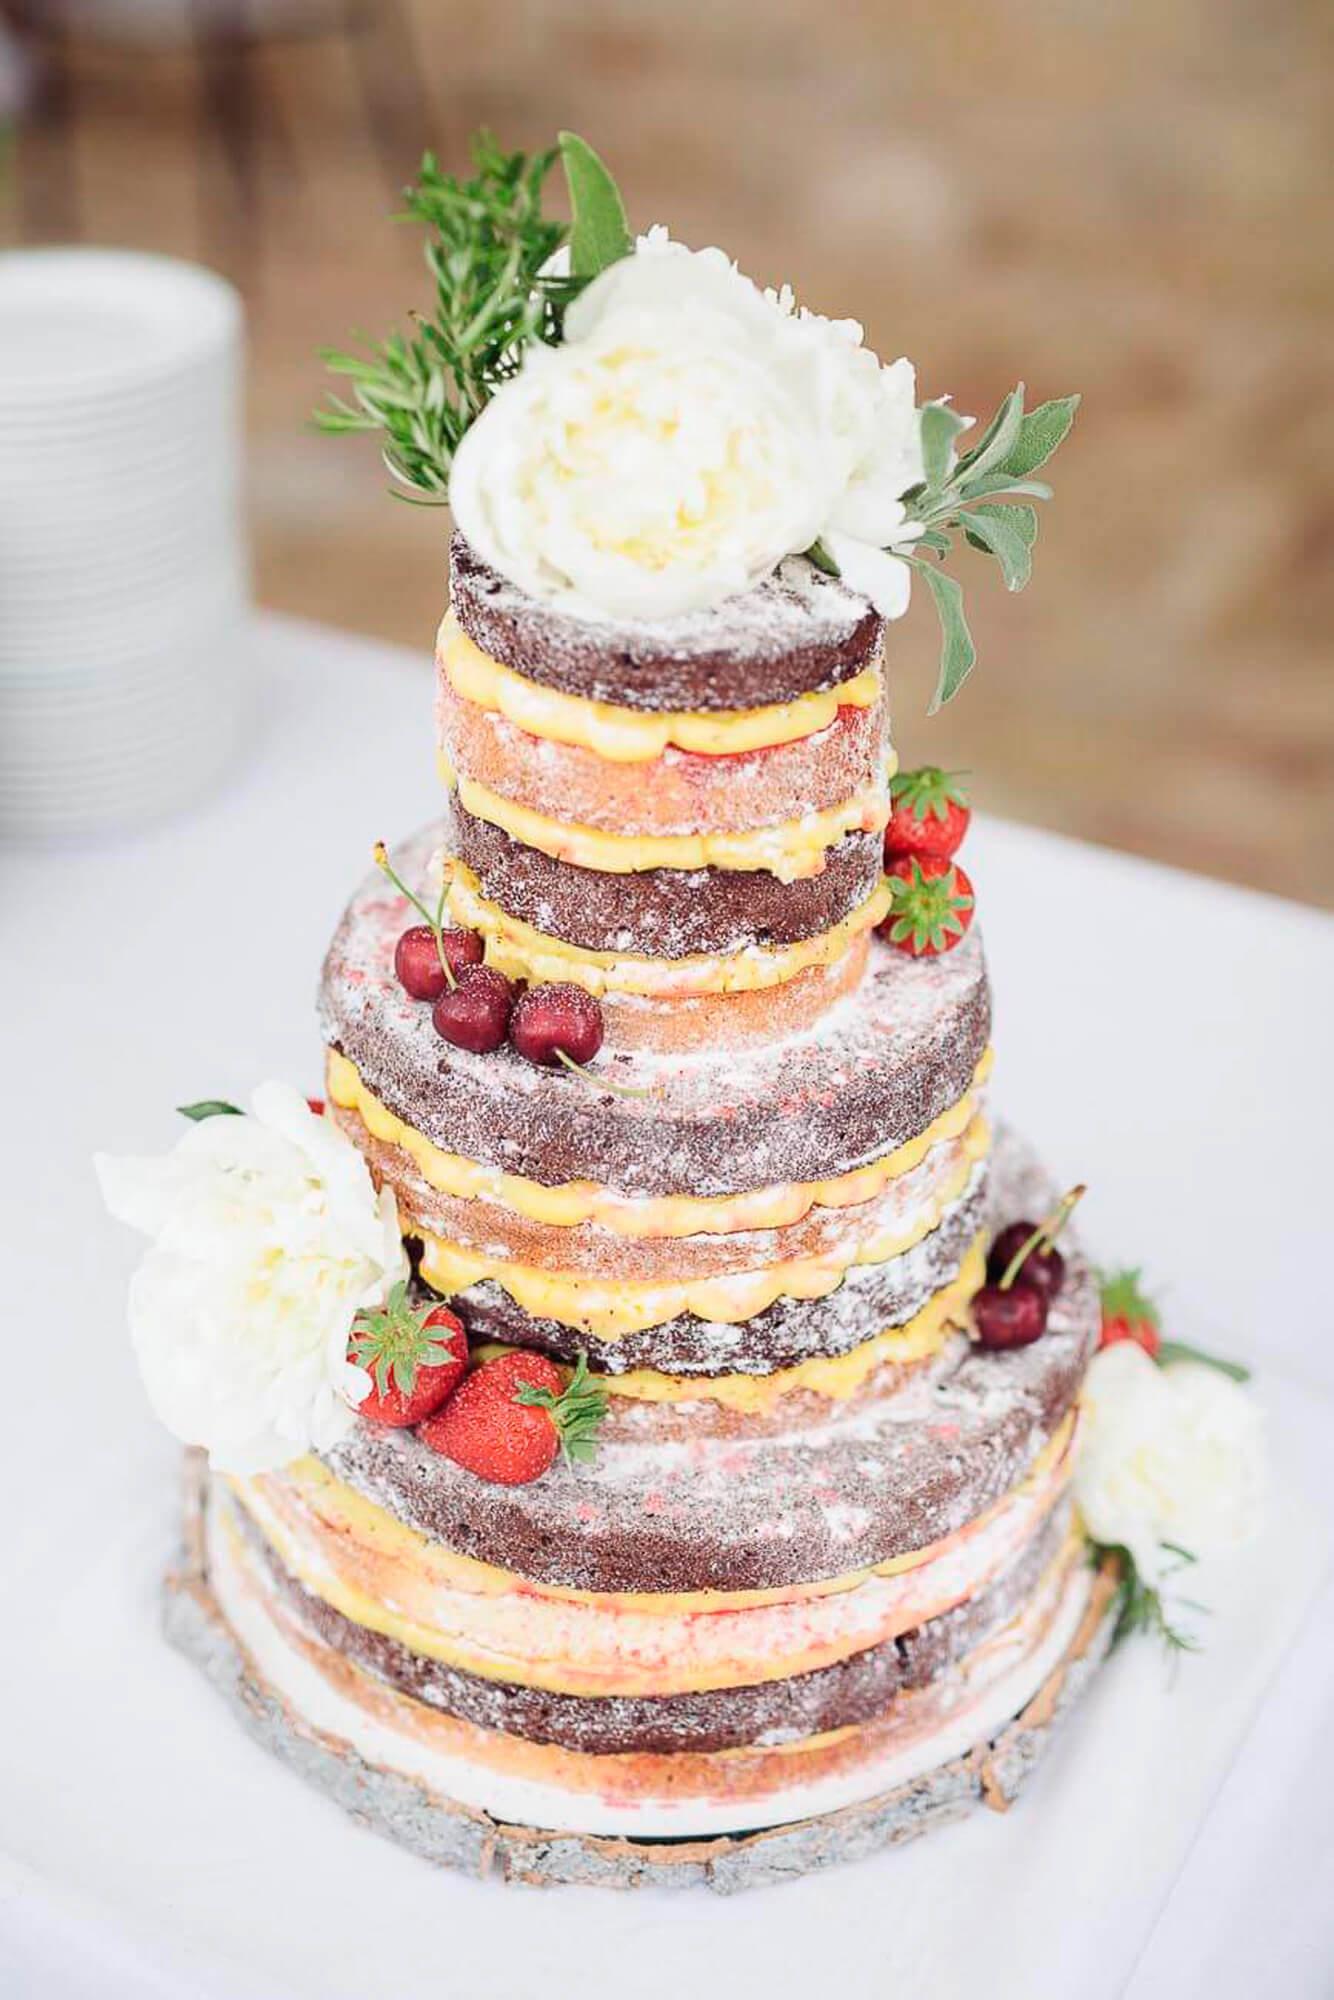 129_wedding_cake.jpg